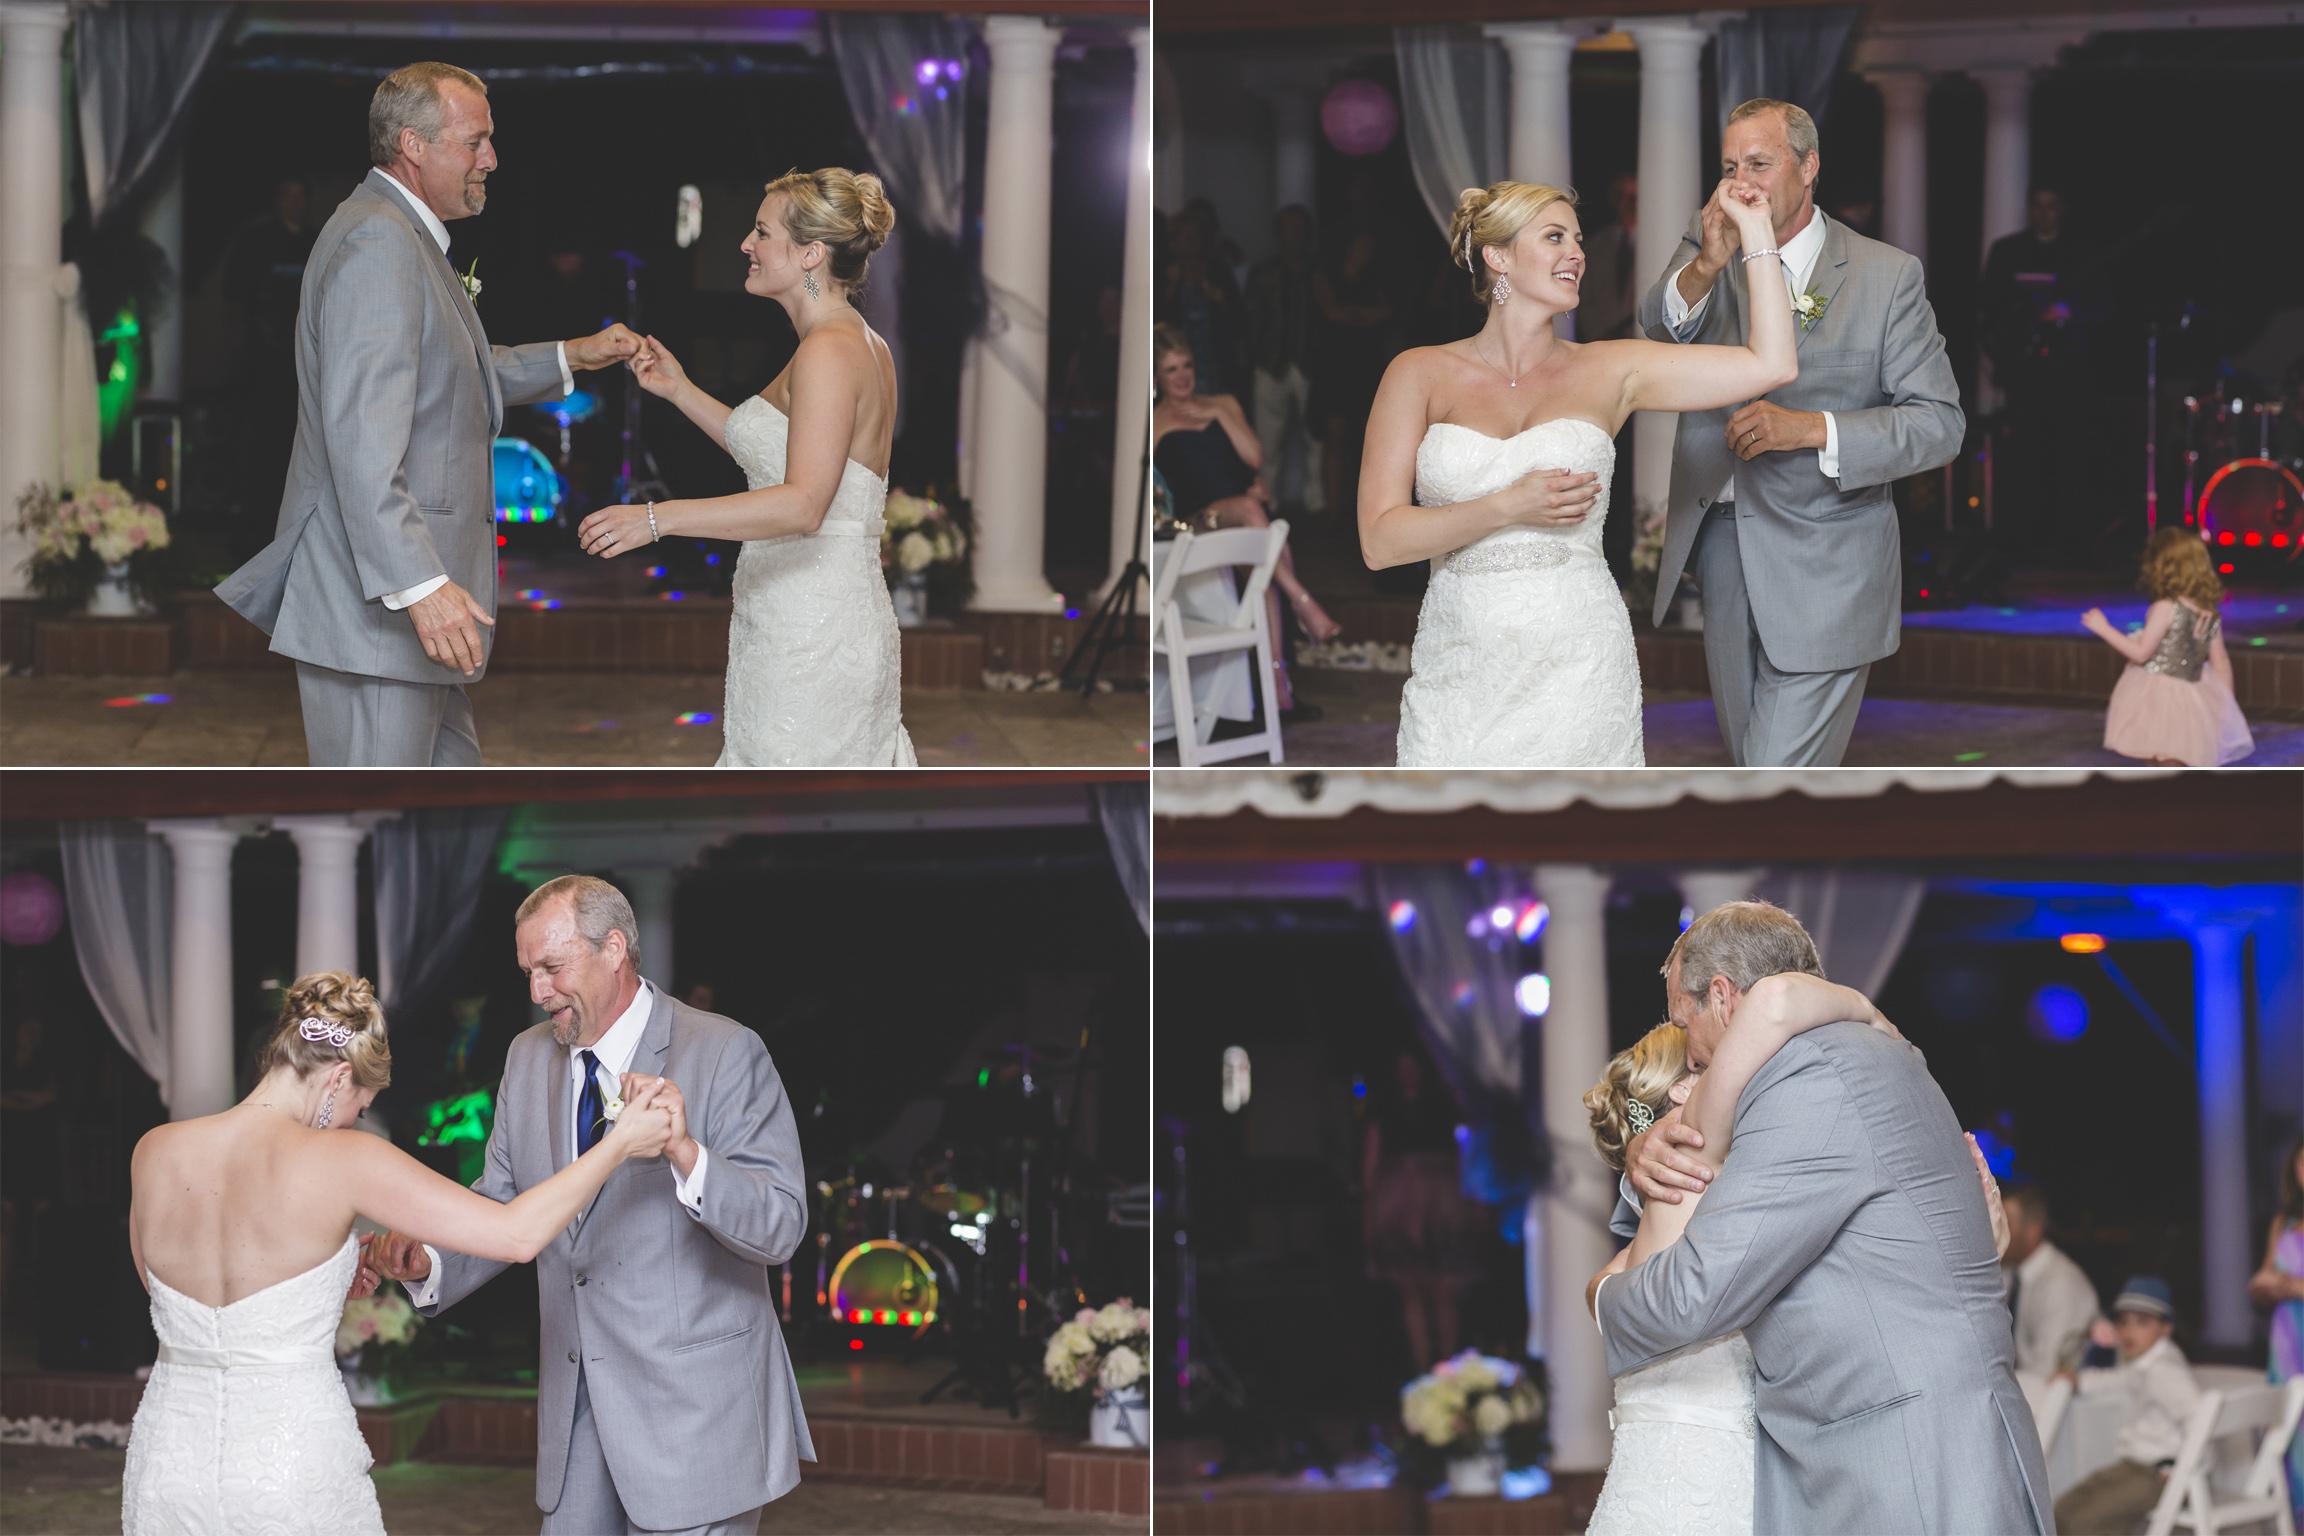 adam-szarmack-casa-marina-wedding-photographer-jacksonville-beach-florida-55.jpg